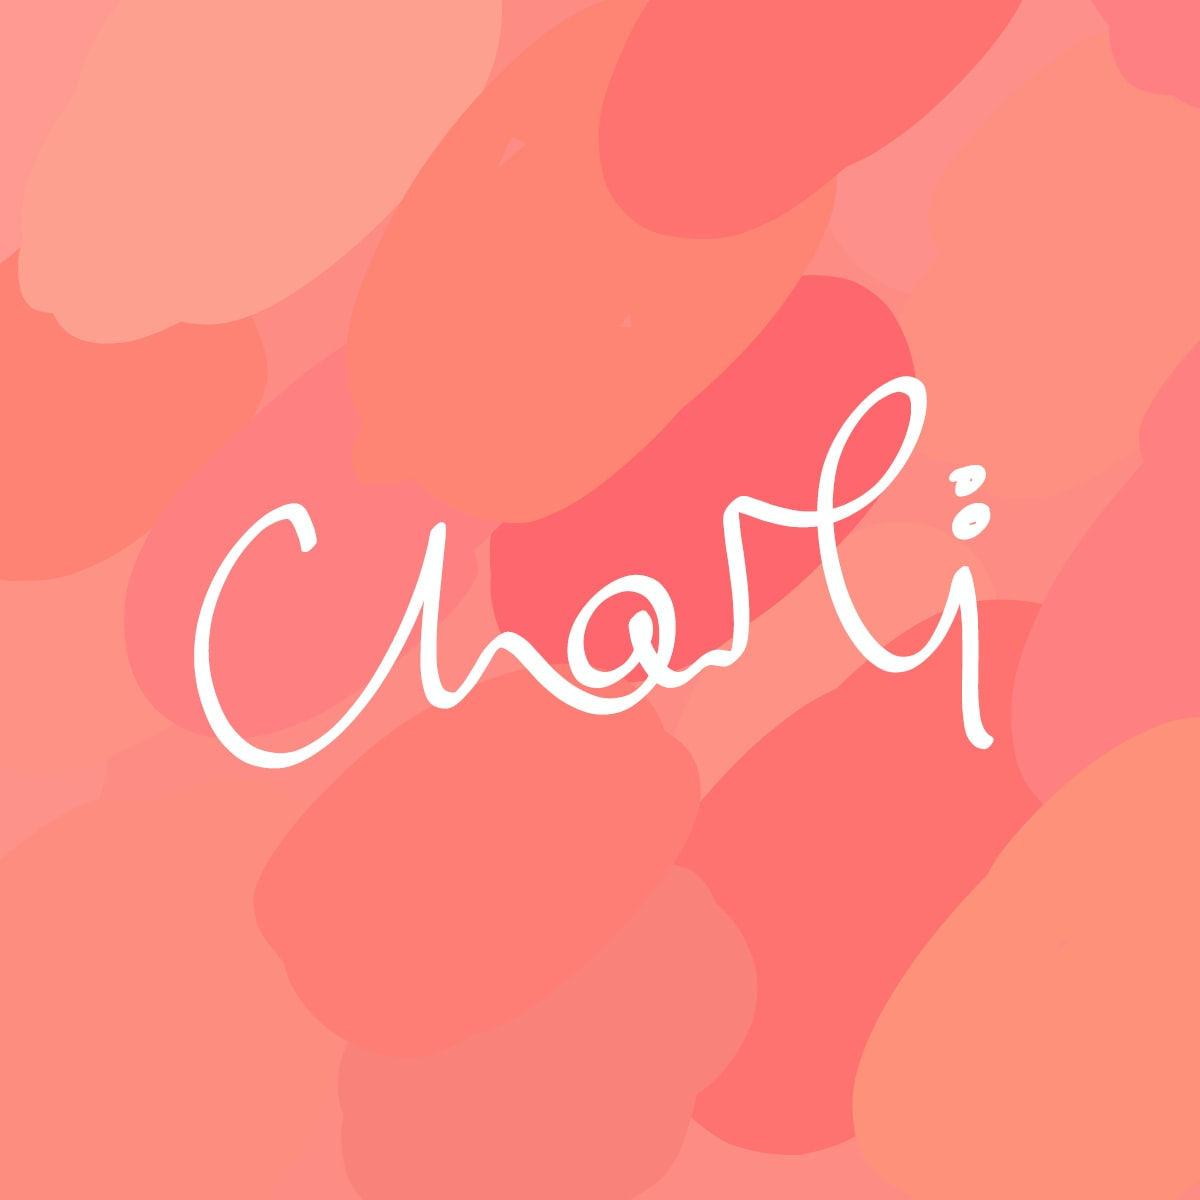 Go to CHARLI's profile